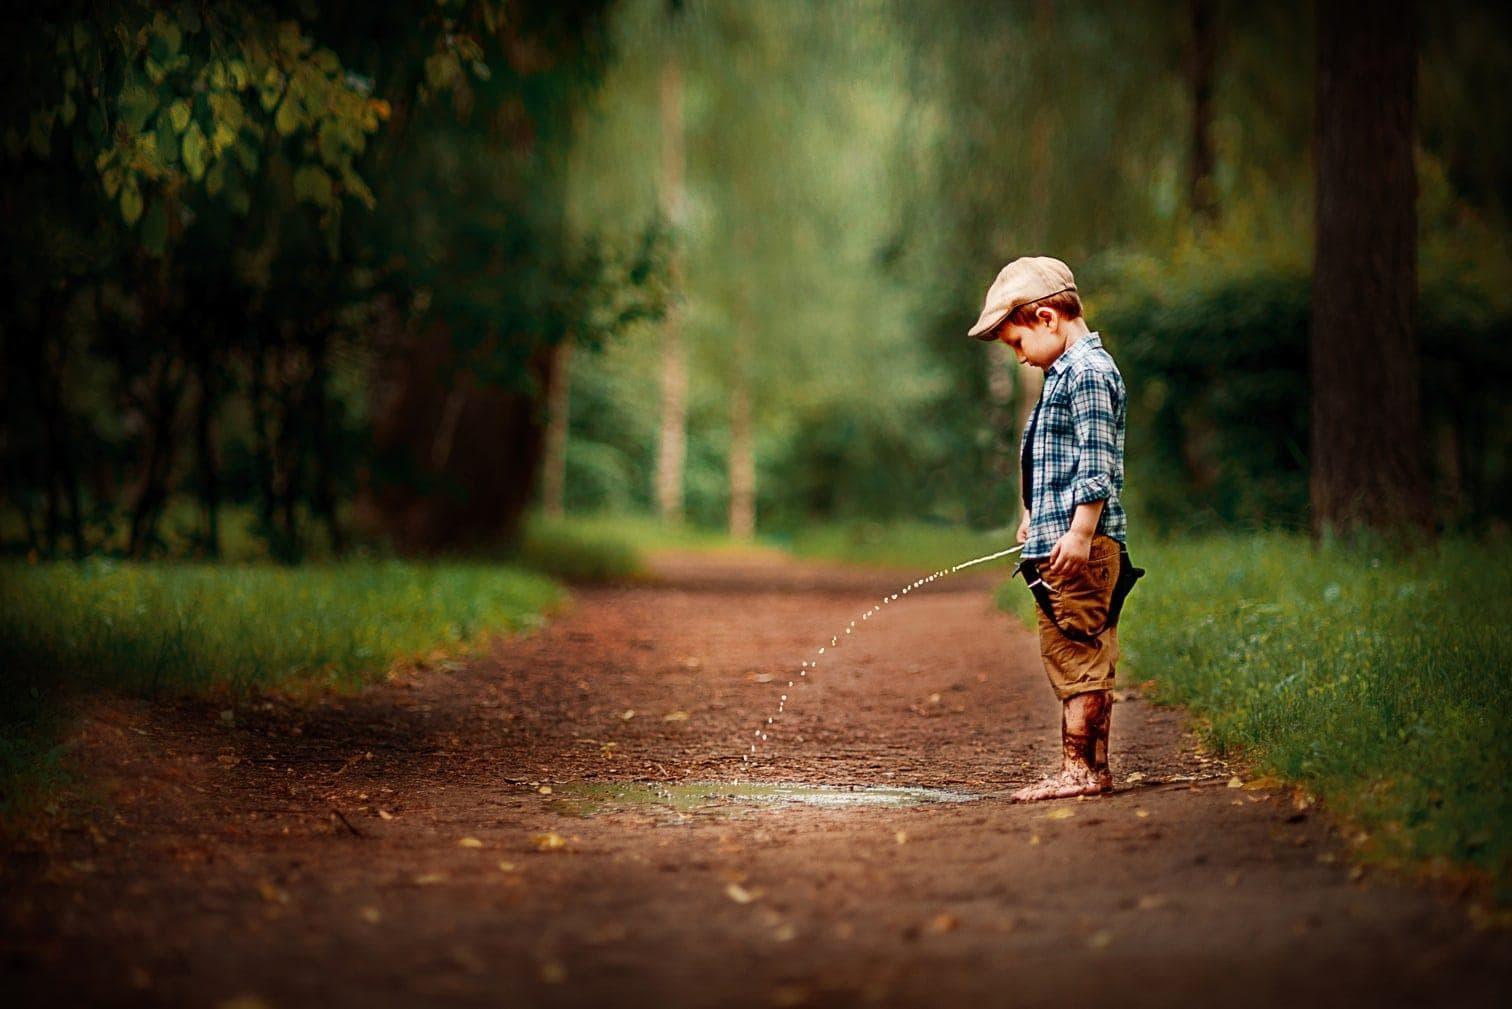 Foto: Shutterstock/taratynova.photo